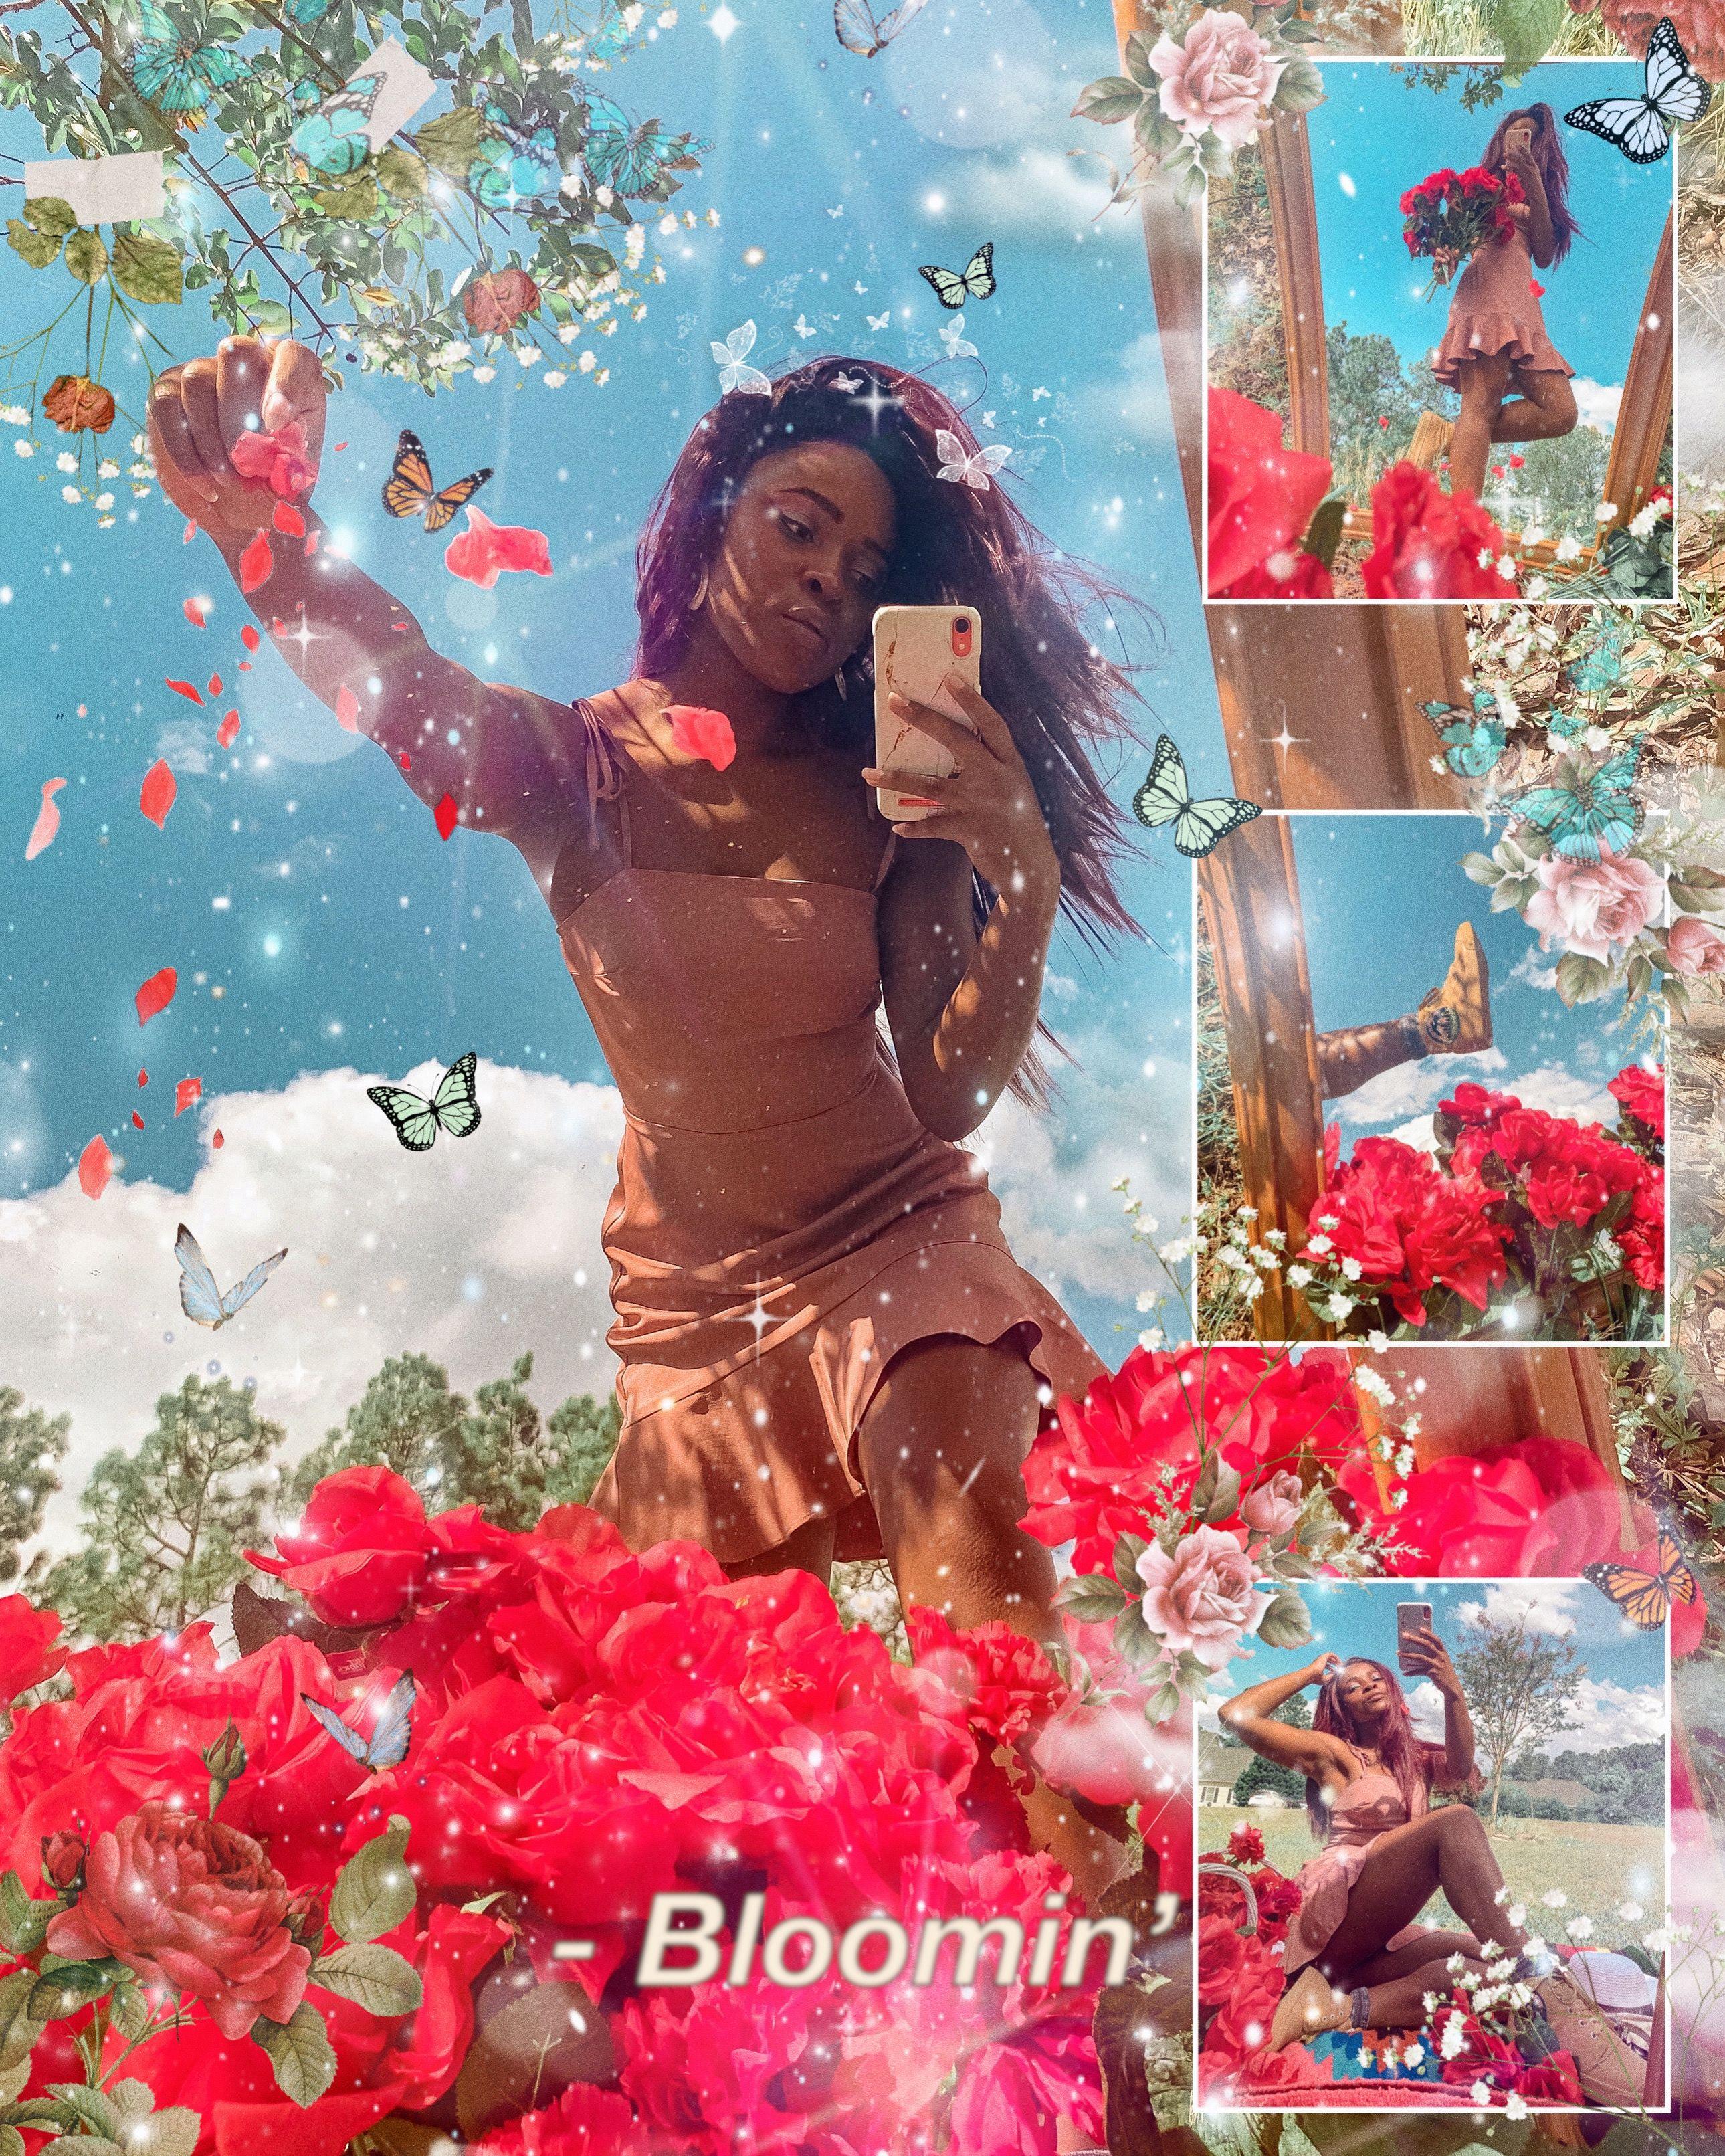 Ig Nikkipaige1396 Mirror Photoshoot Tiktok Trend In Spring Wearing Bangs Shoes Creative Photoshoot Ideas Spring Photoshoot Flower Photoshoot